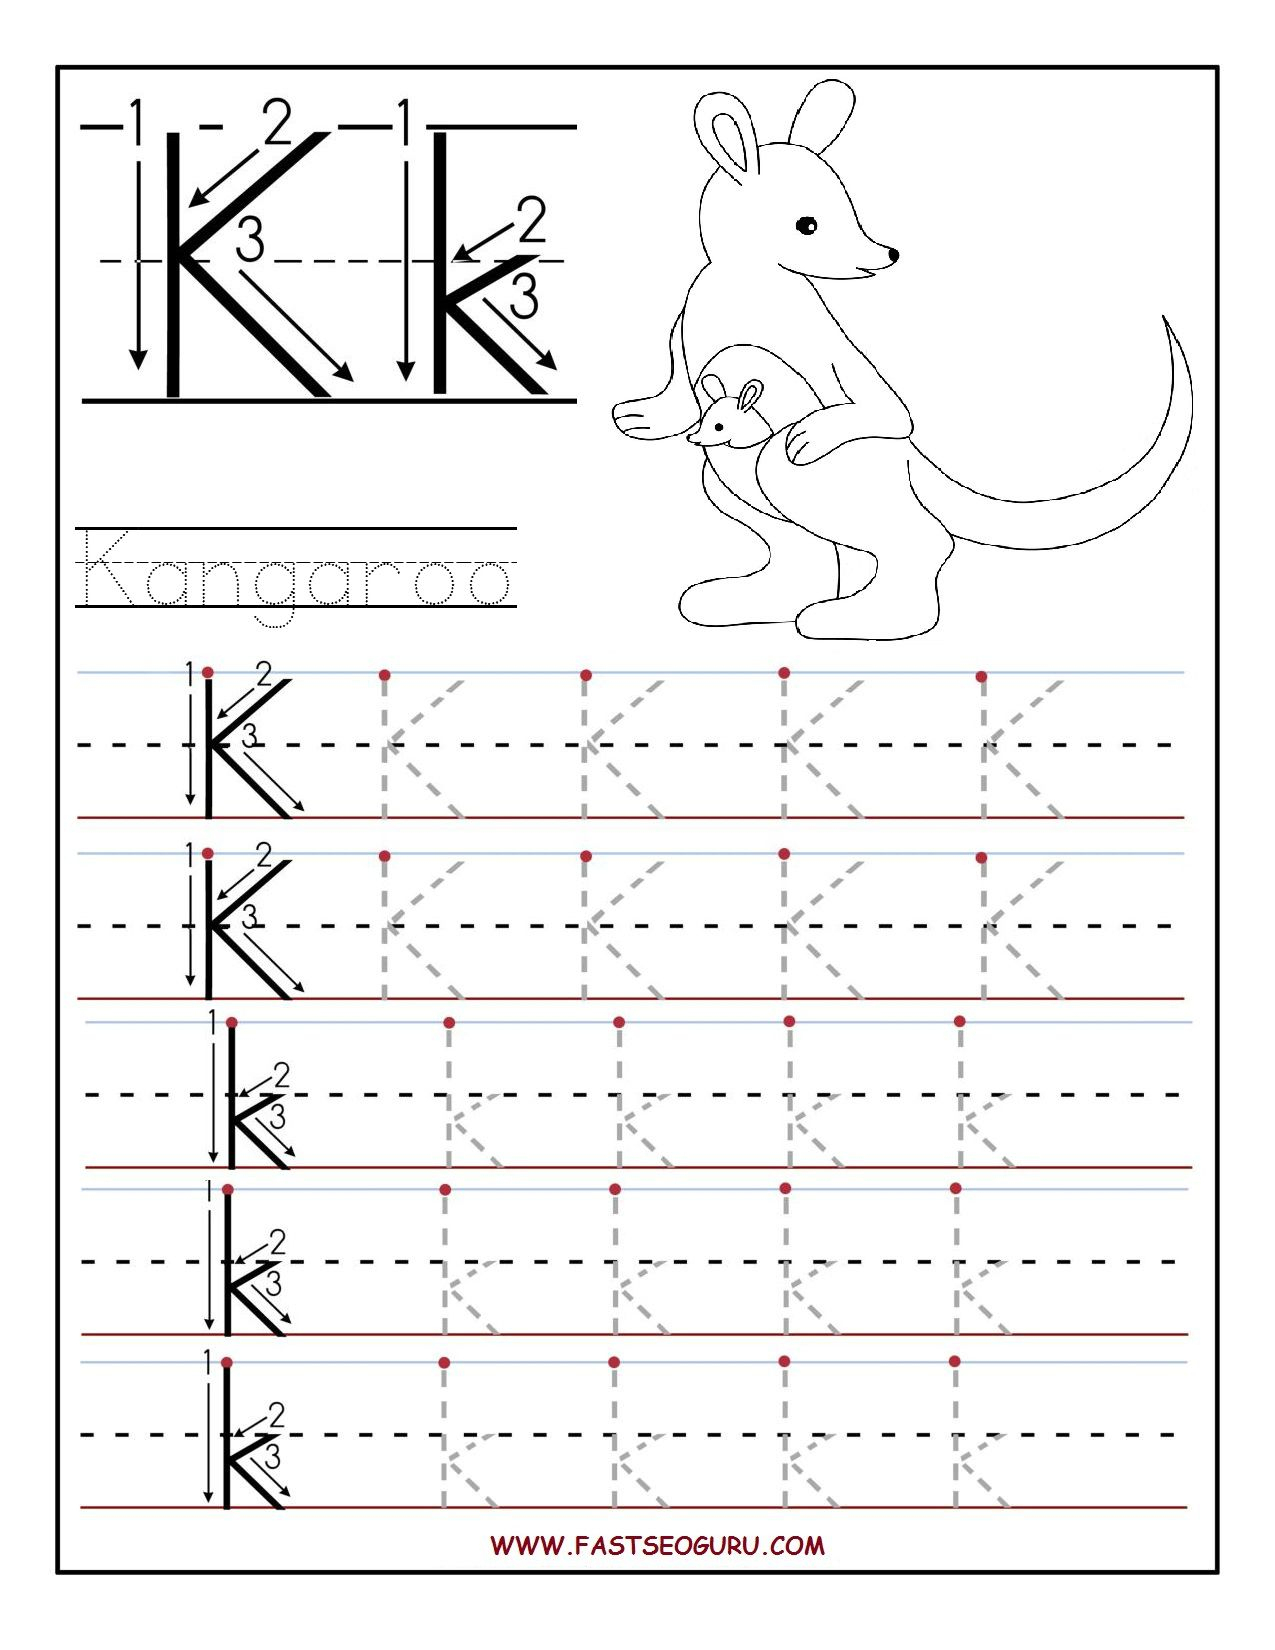 Printable Letter K Tracing Worksheets For Preschool | Learning | Free Printable Letter K Worksheets